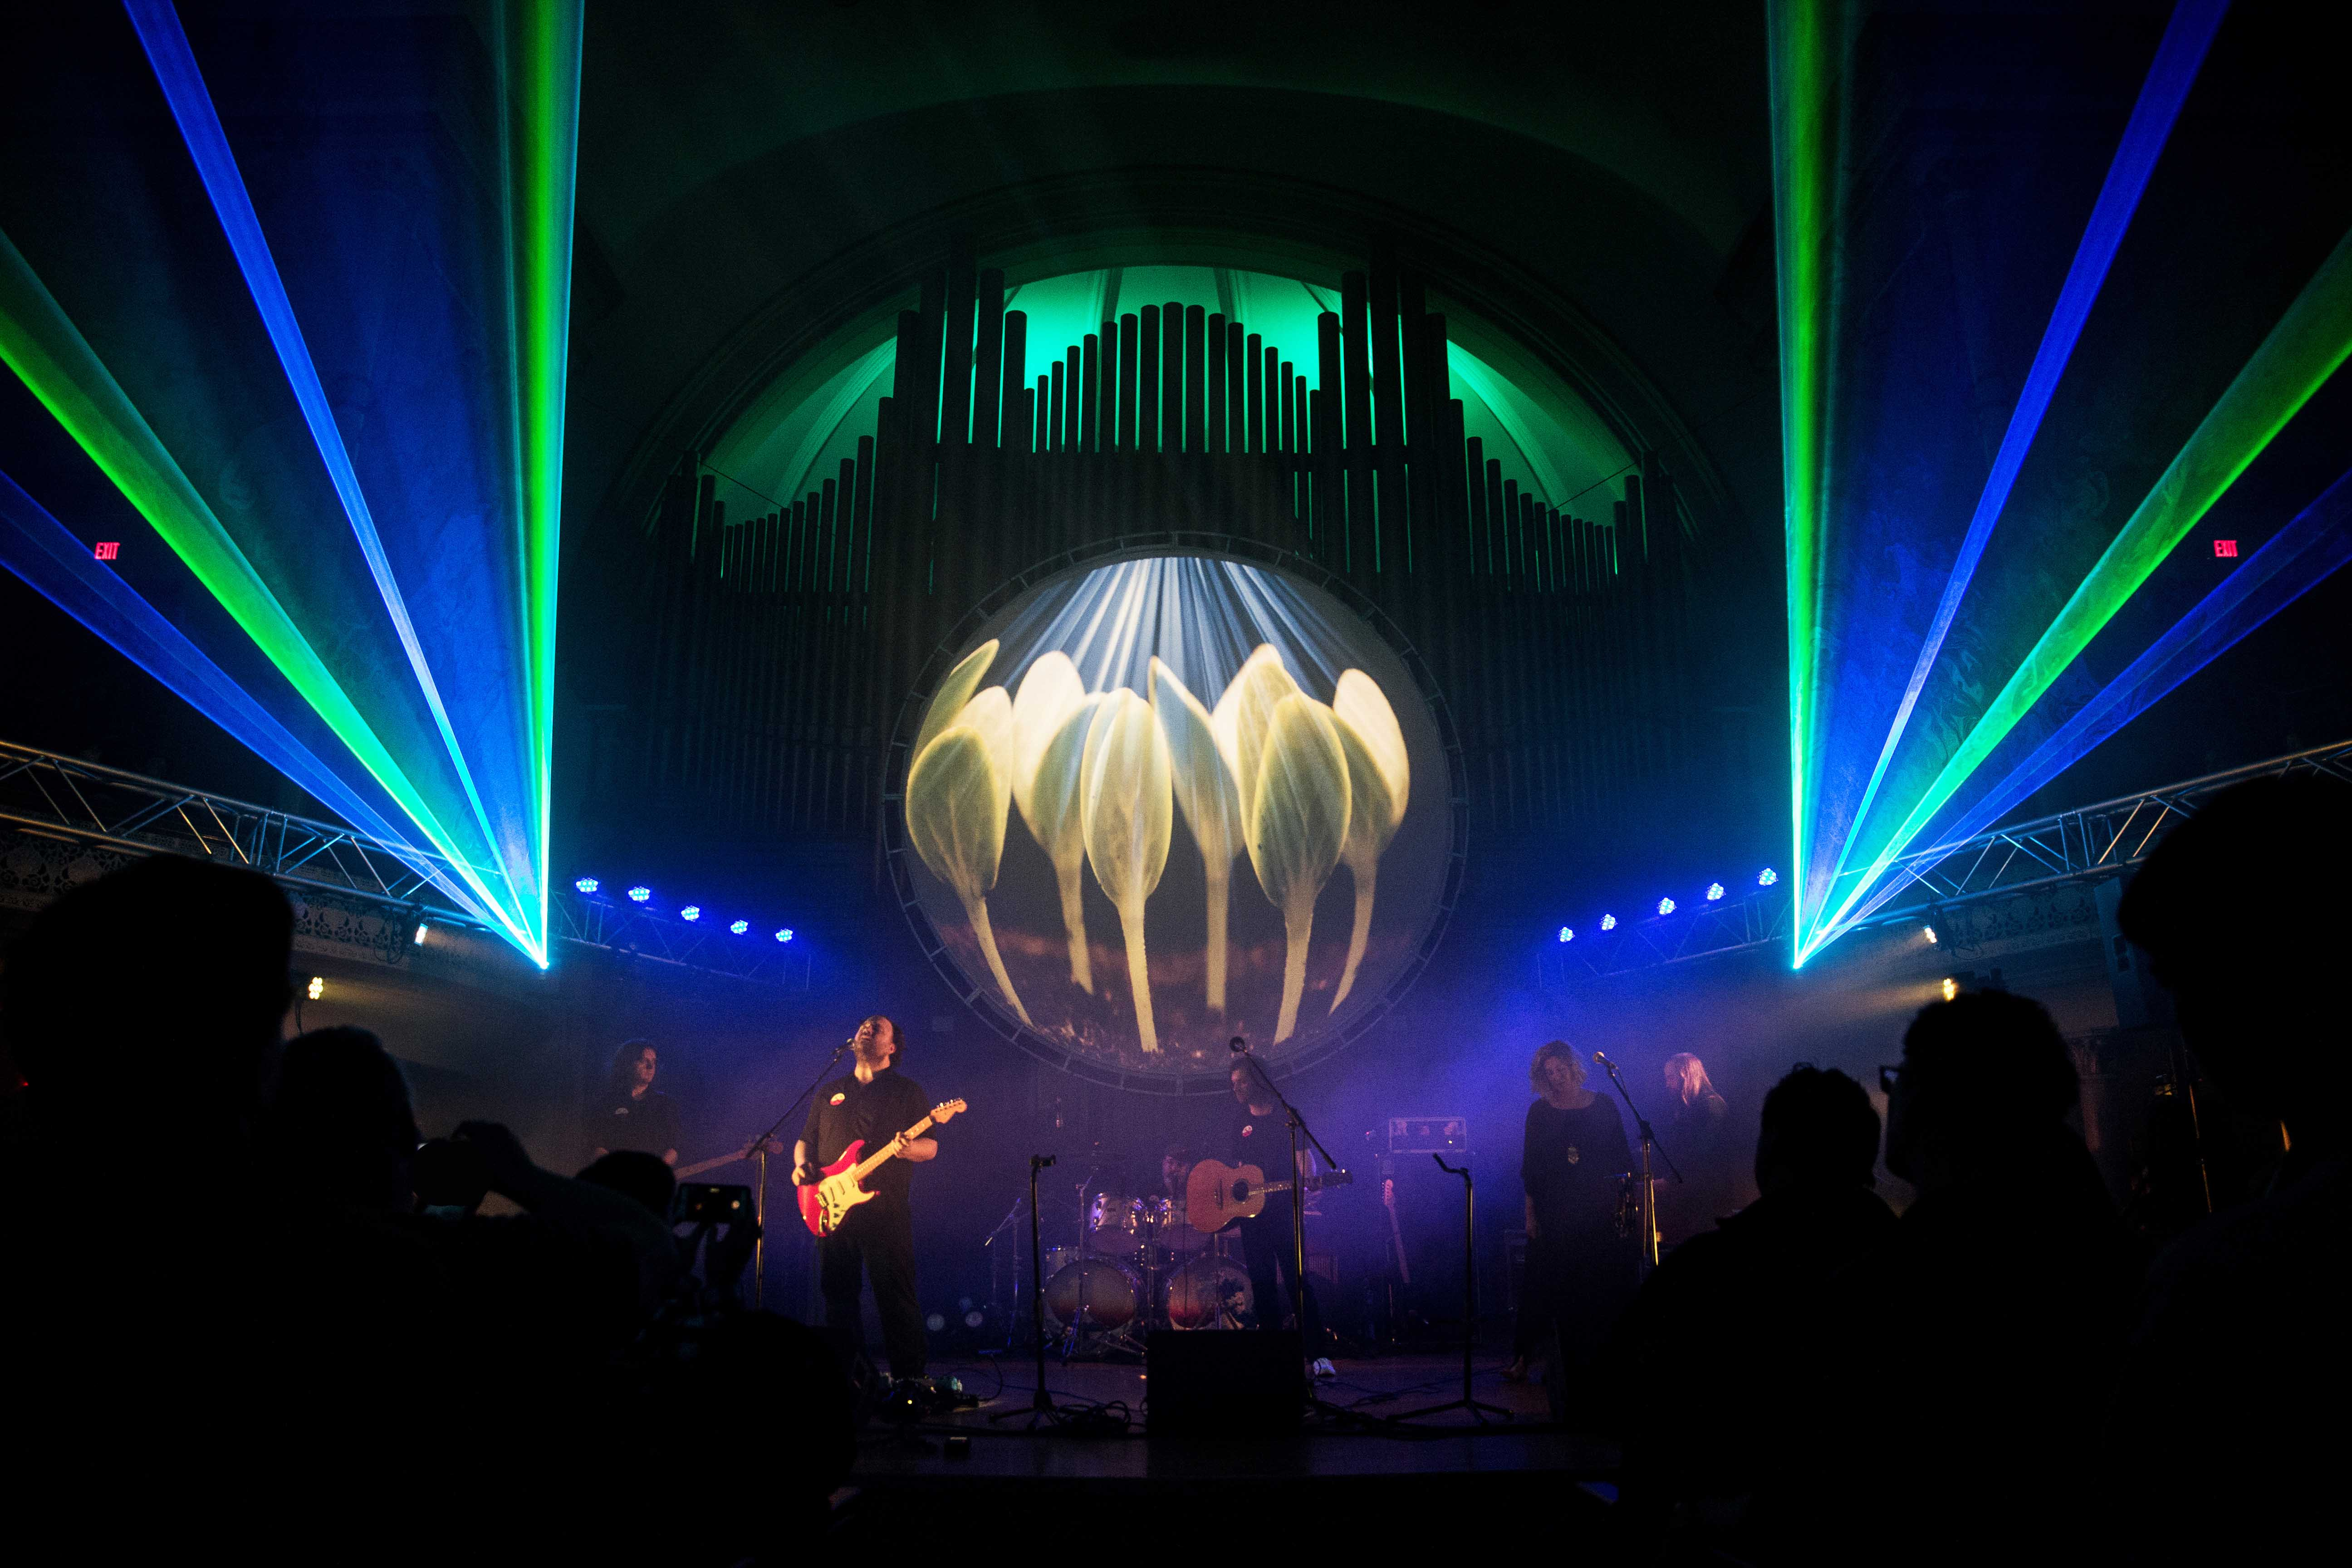 PIGS Pink Floyd Tribute - Lasers